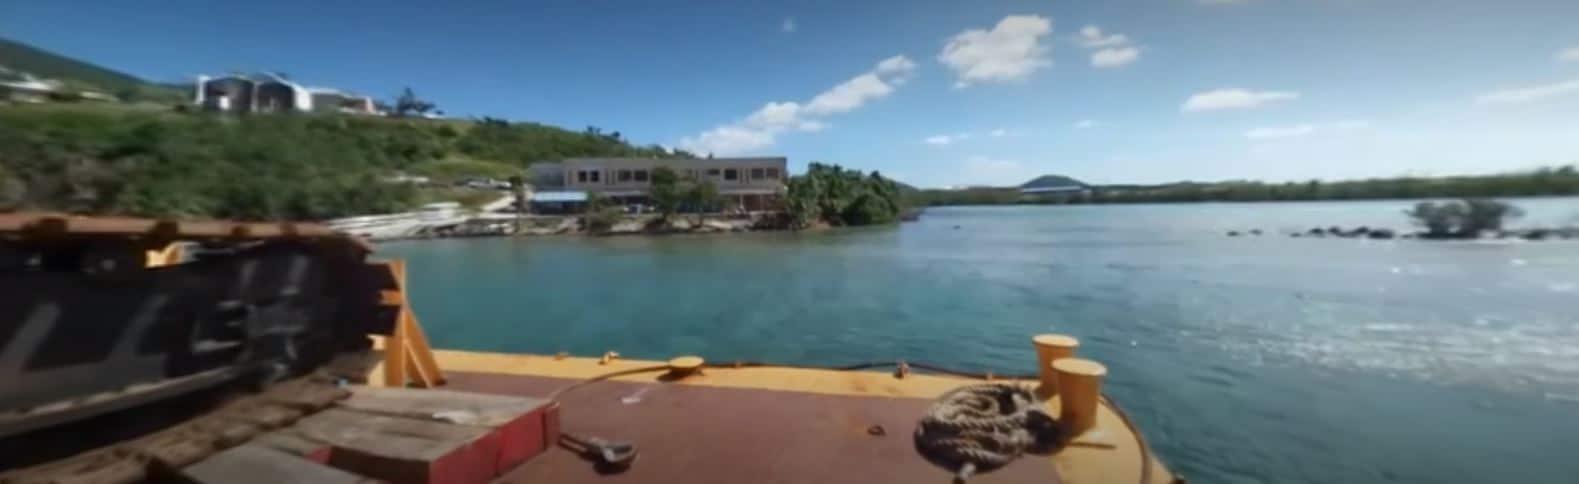 Construction Companies Us Virgin Islands